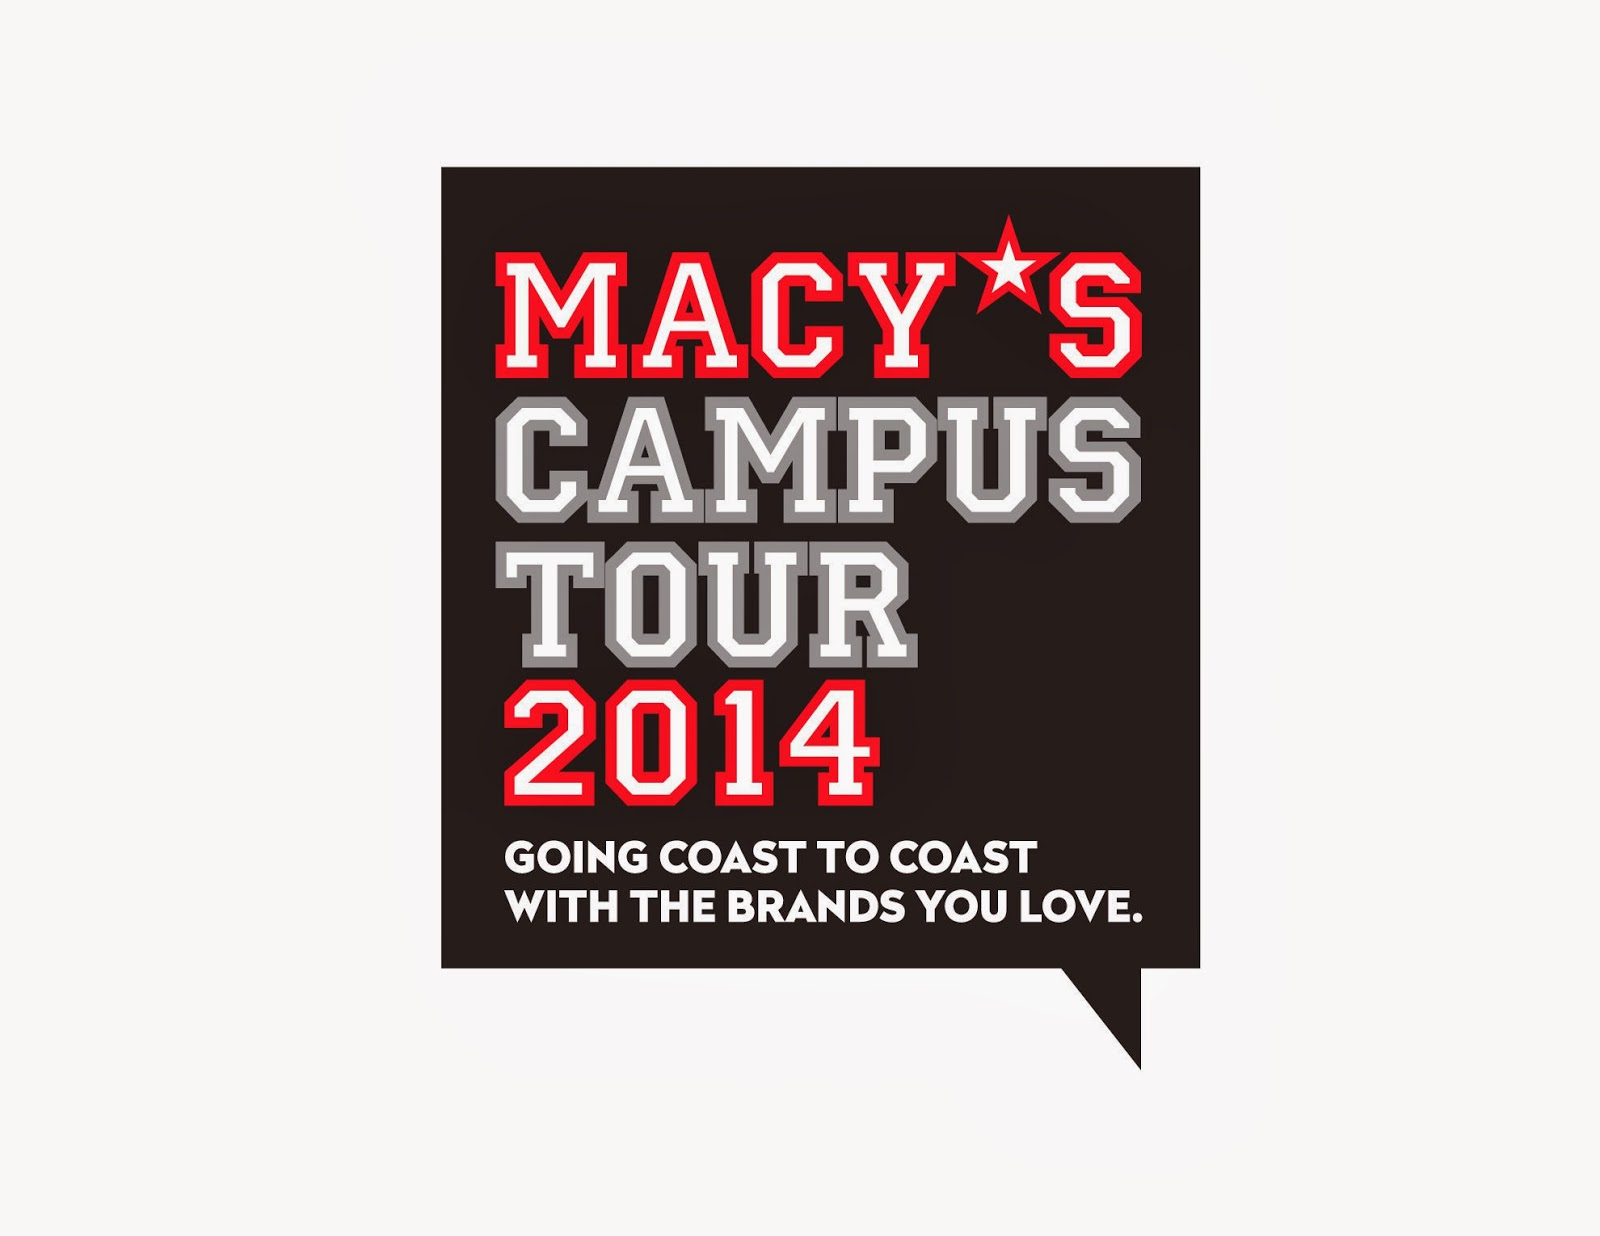 http://macyscampustour.com